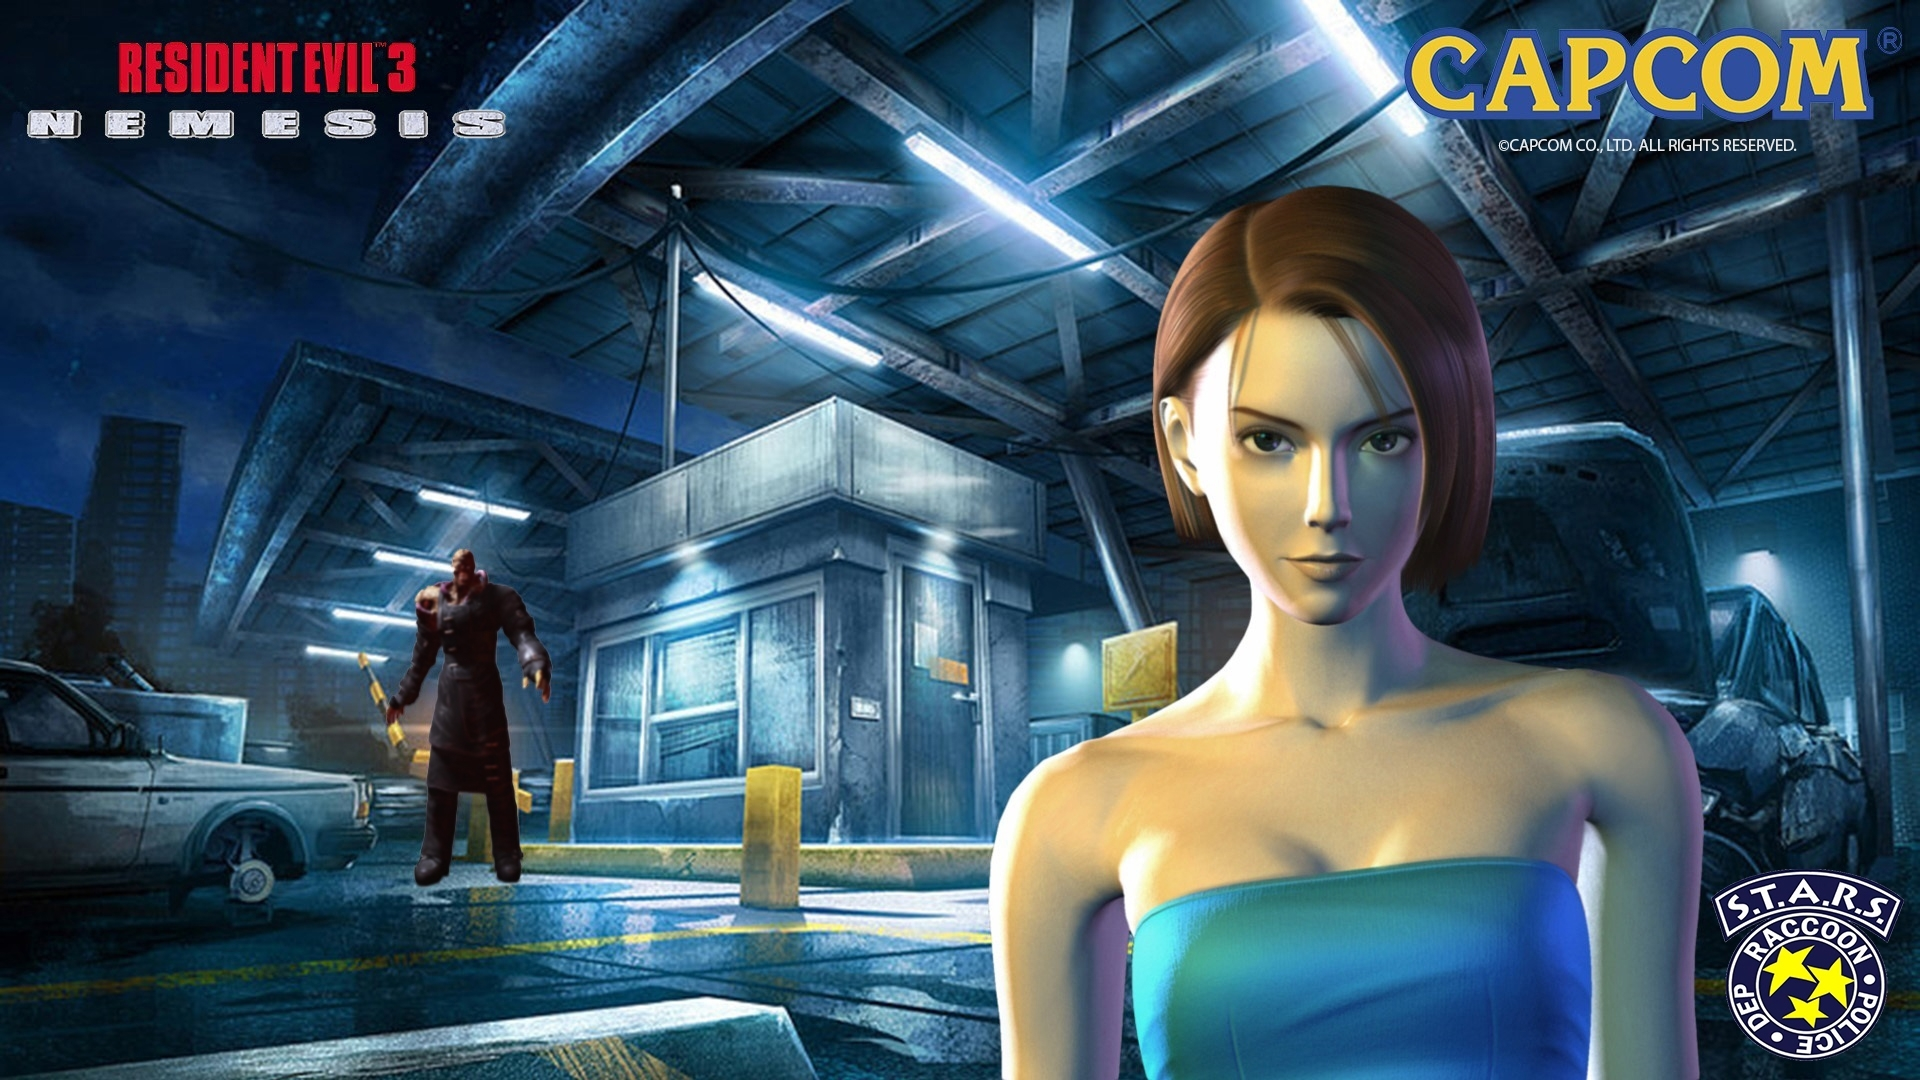 resident evil 3: nemesis full hd wallpaper and background image